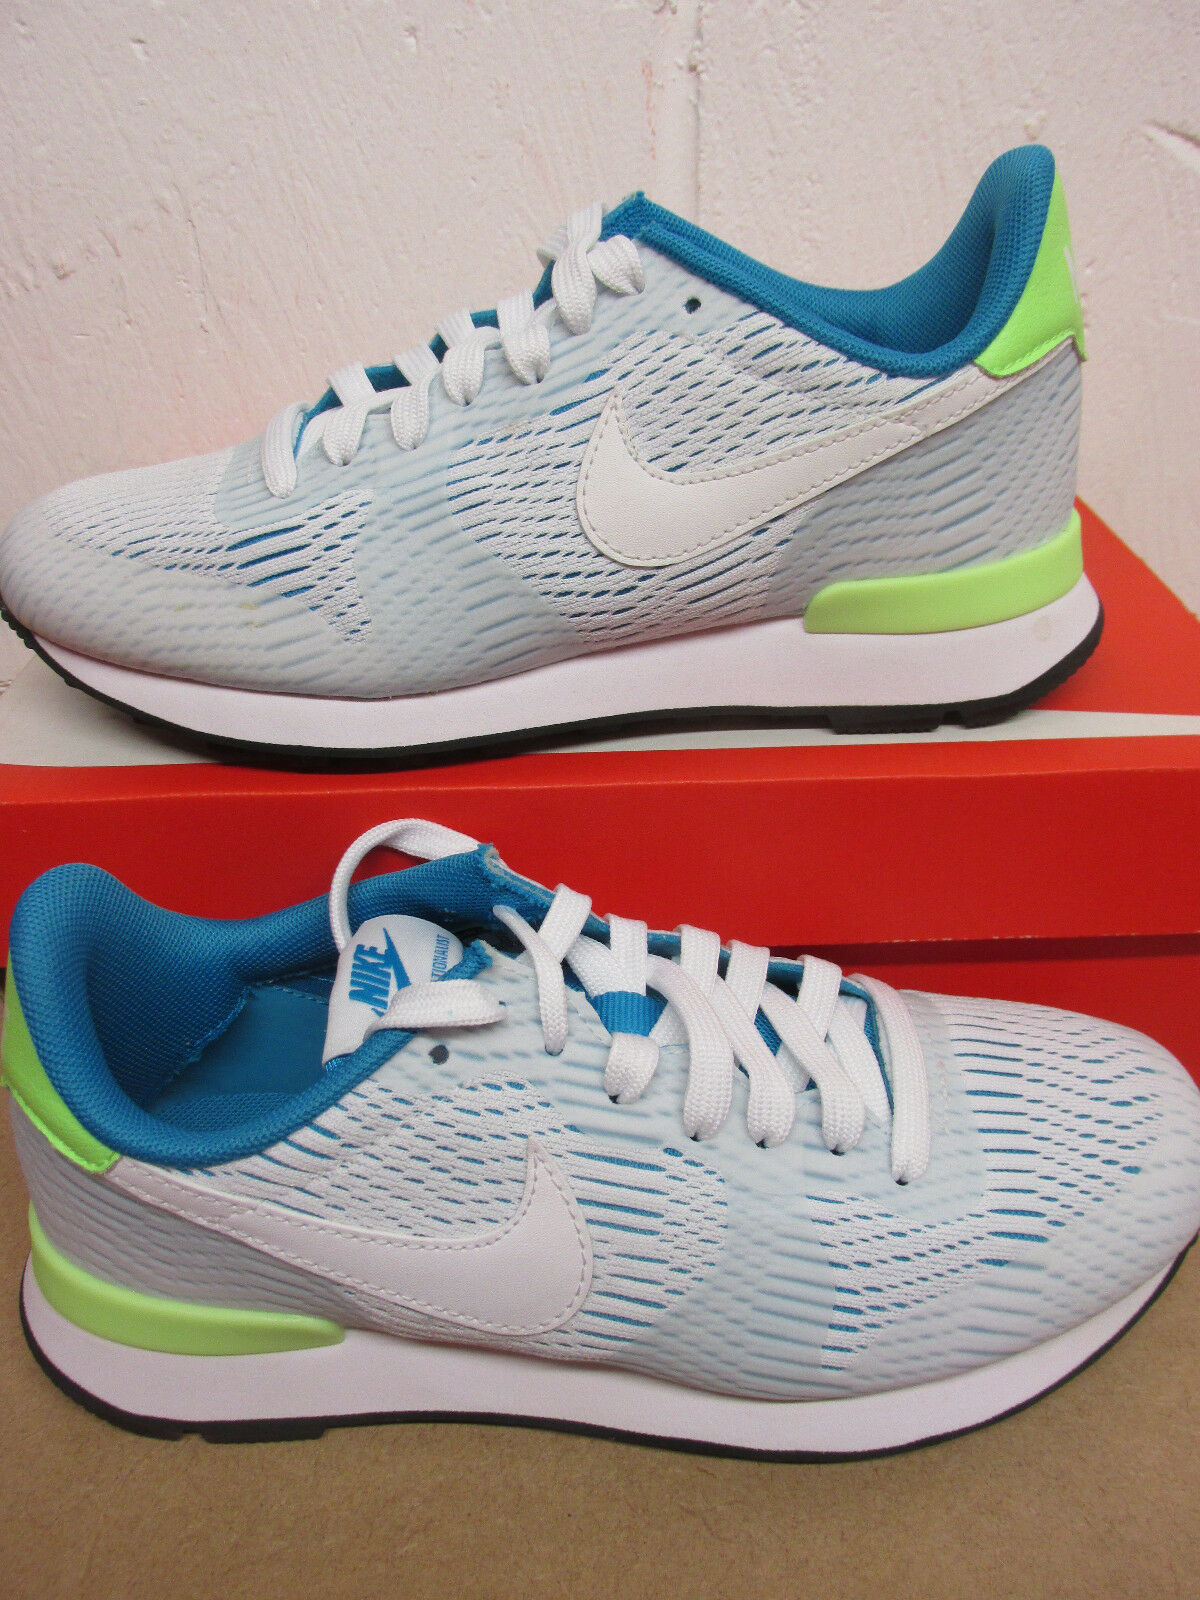 Nike Femme Internationalist EM Running Trainers 833815 Sneakers Chaussures